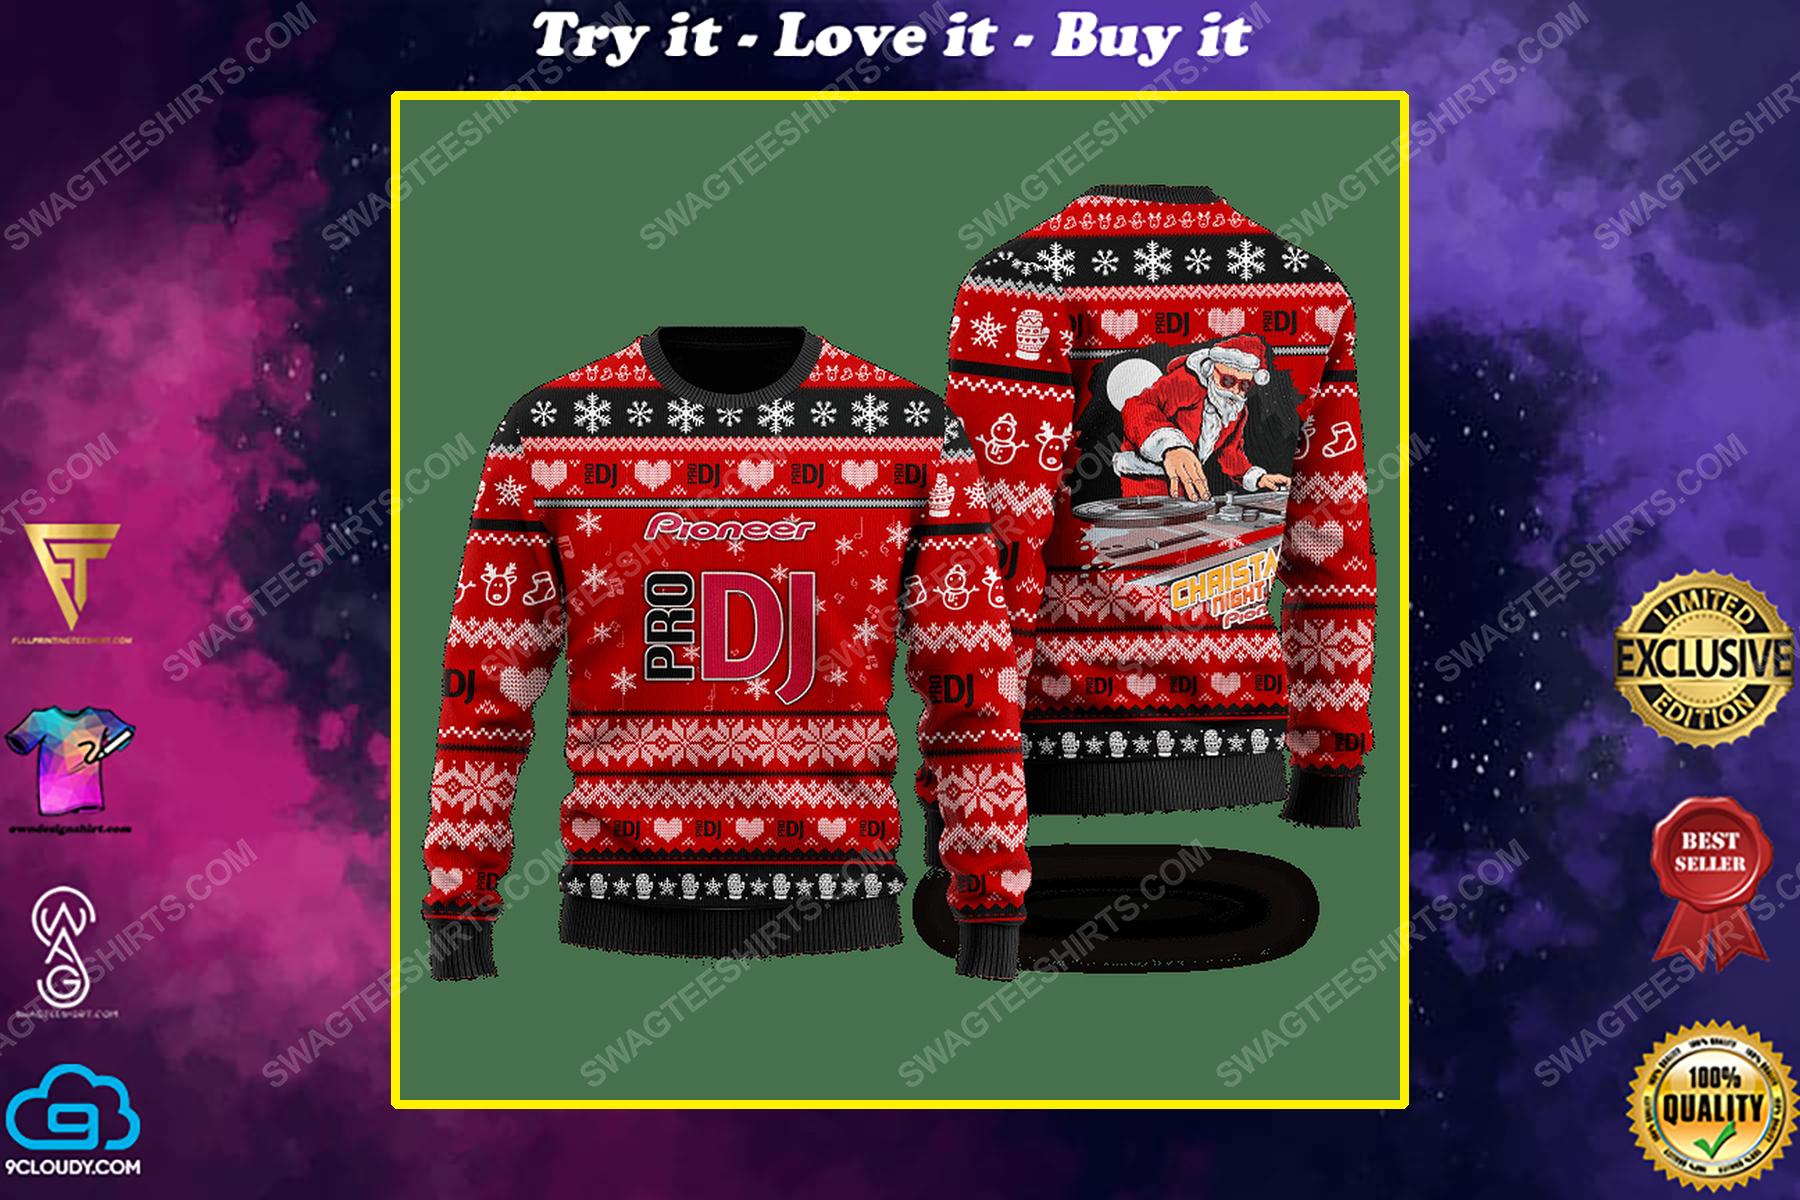 Pioneer pro dj santa claus ugly christmas sweater 1